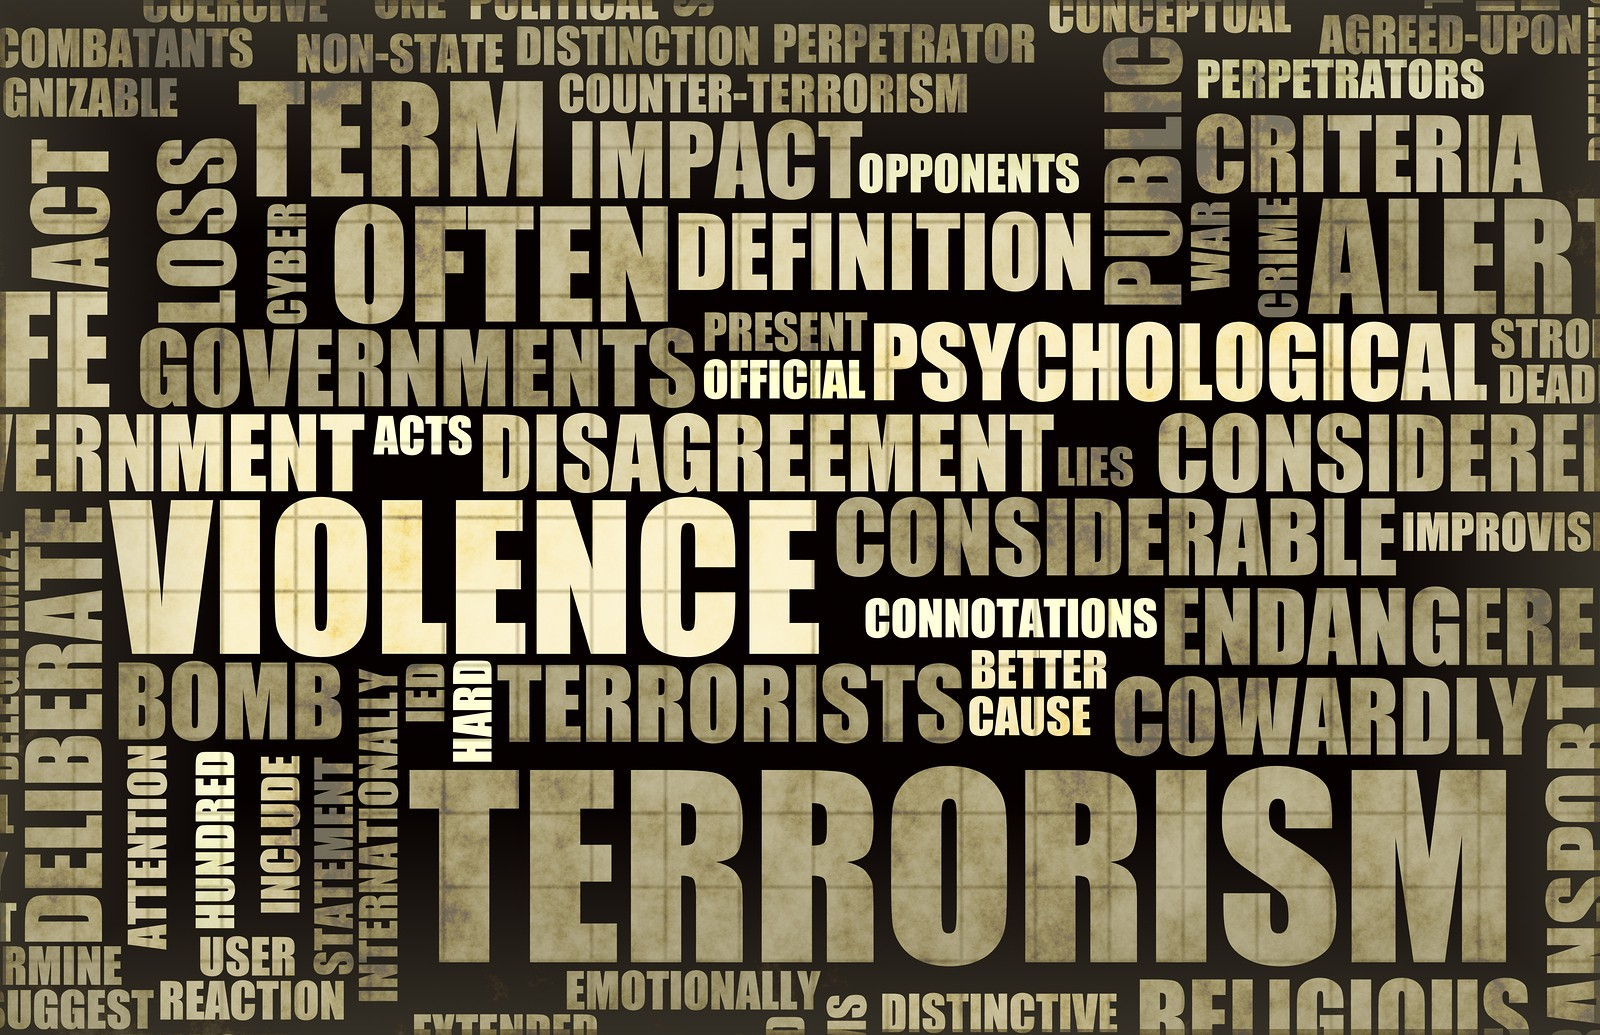 Terrorism in the News Headline Newspaper Art